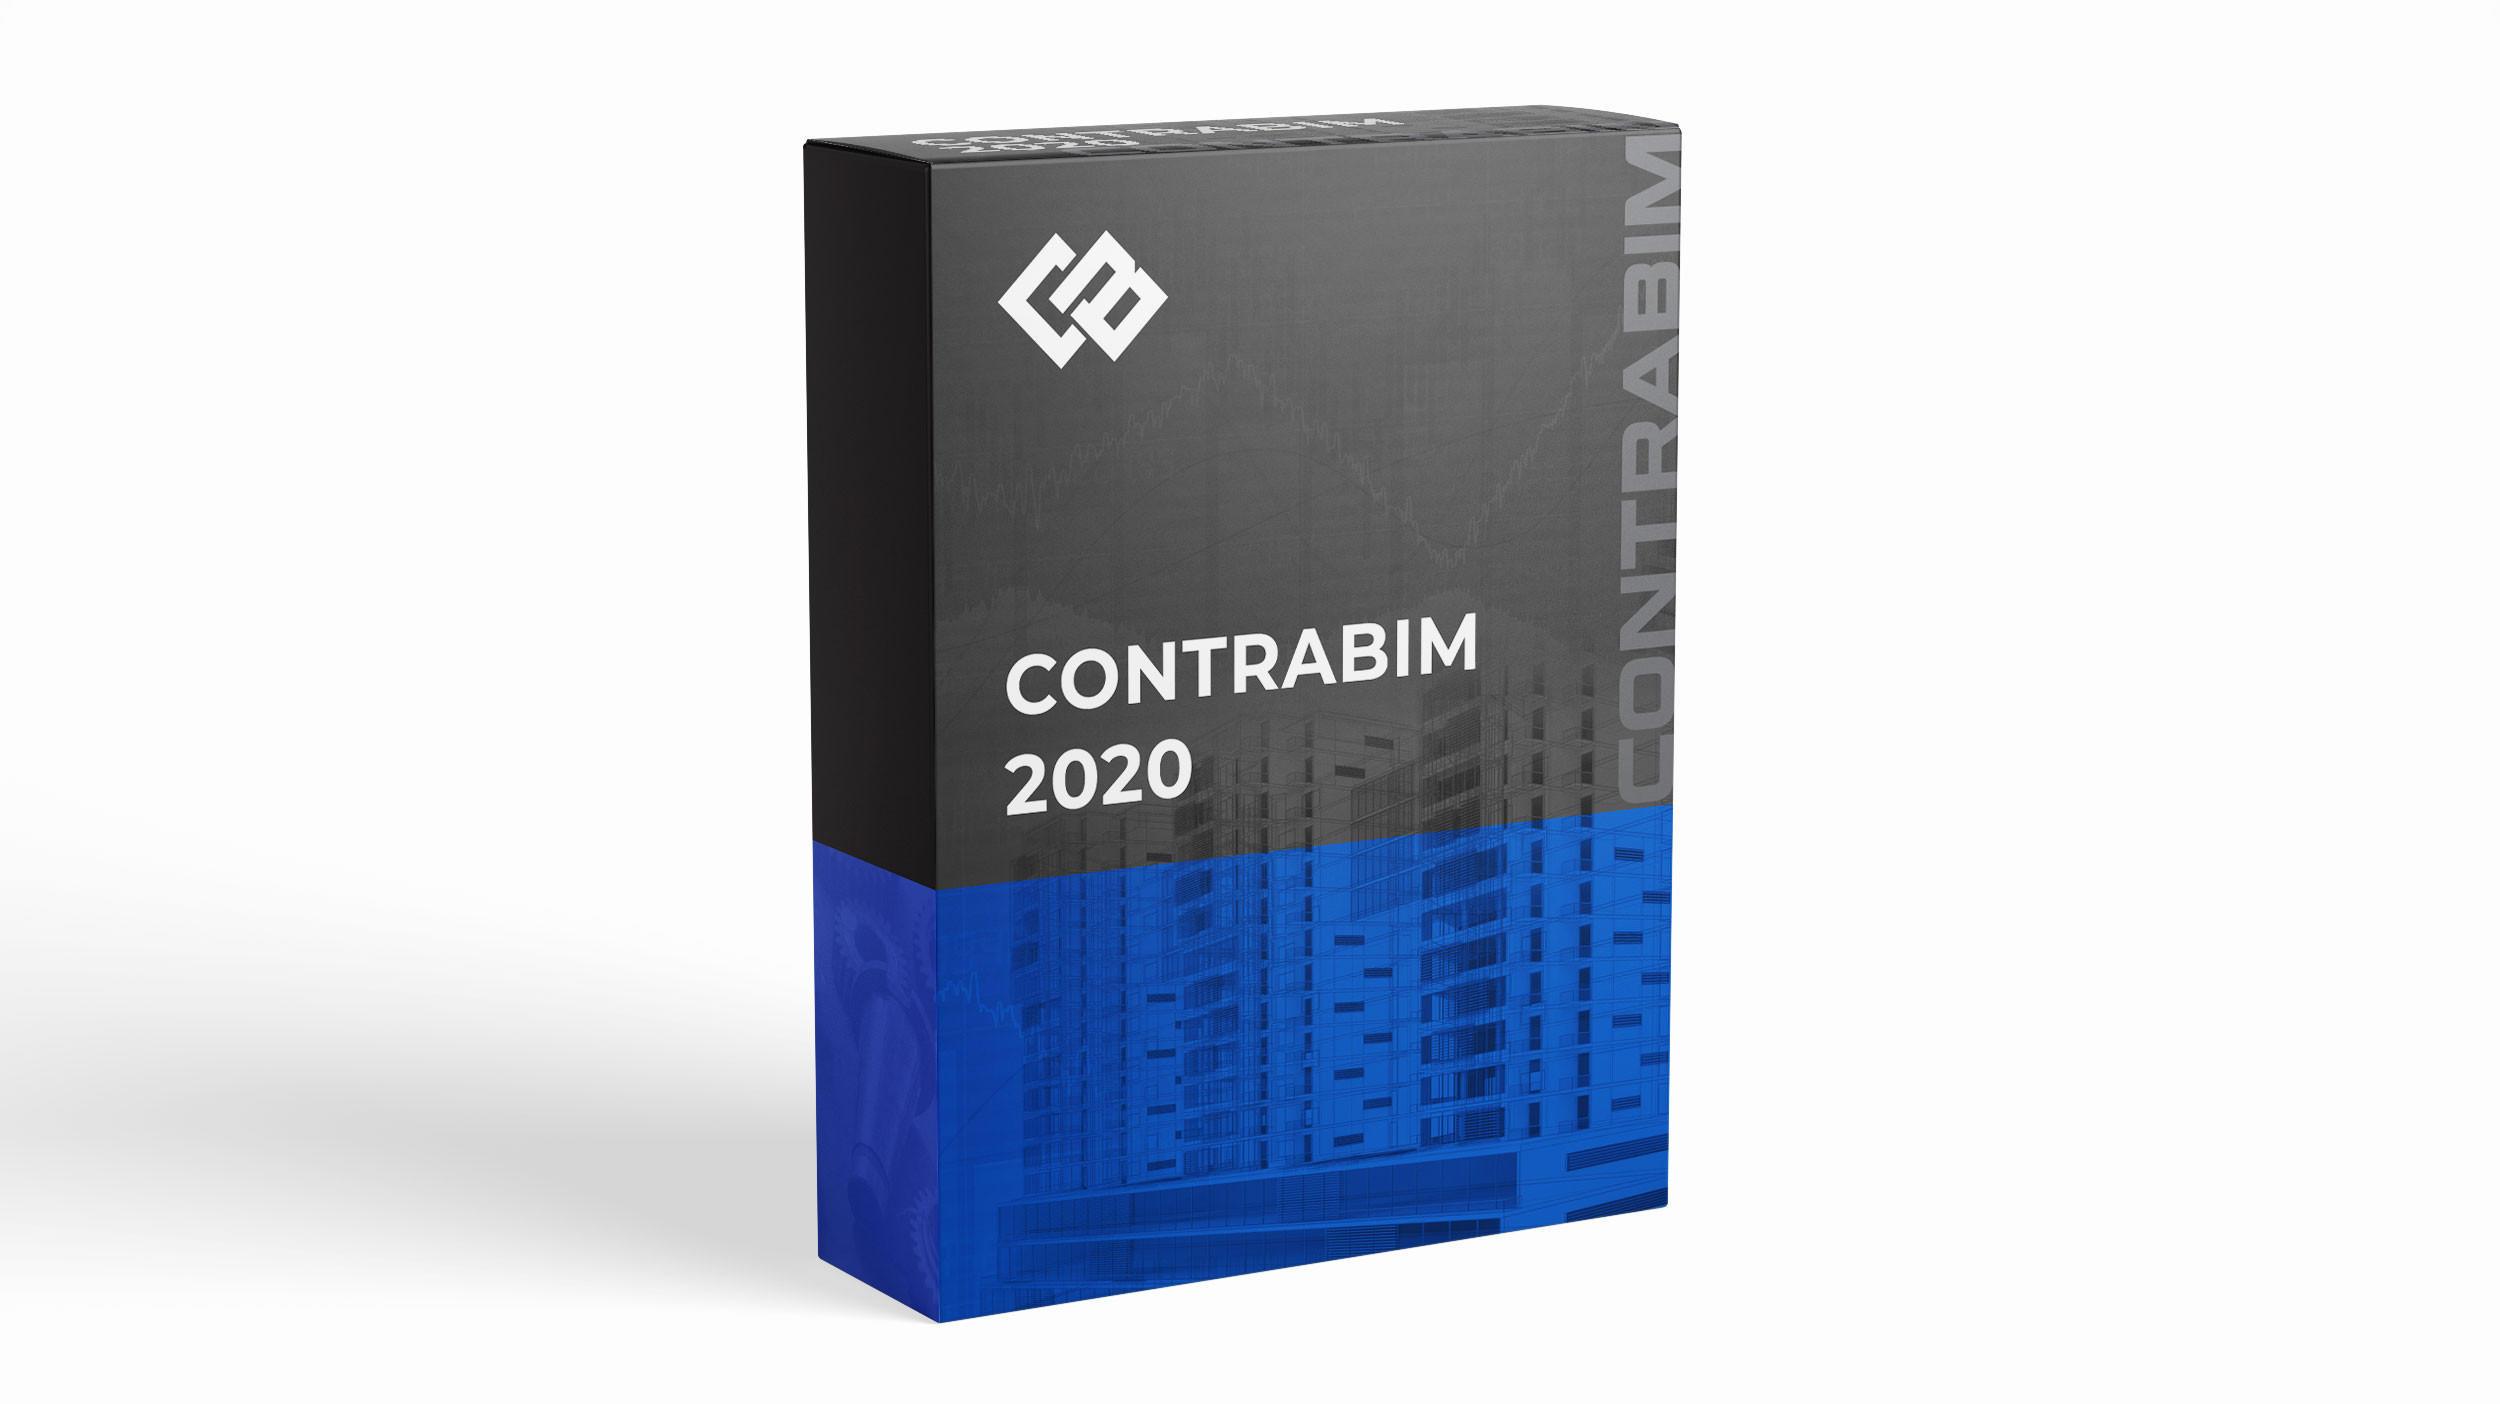 CONTRABIM 2020